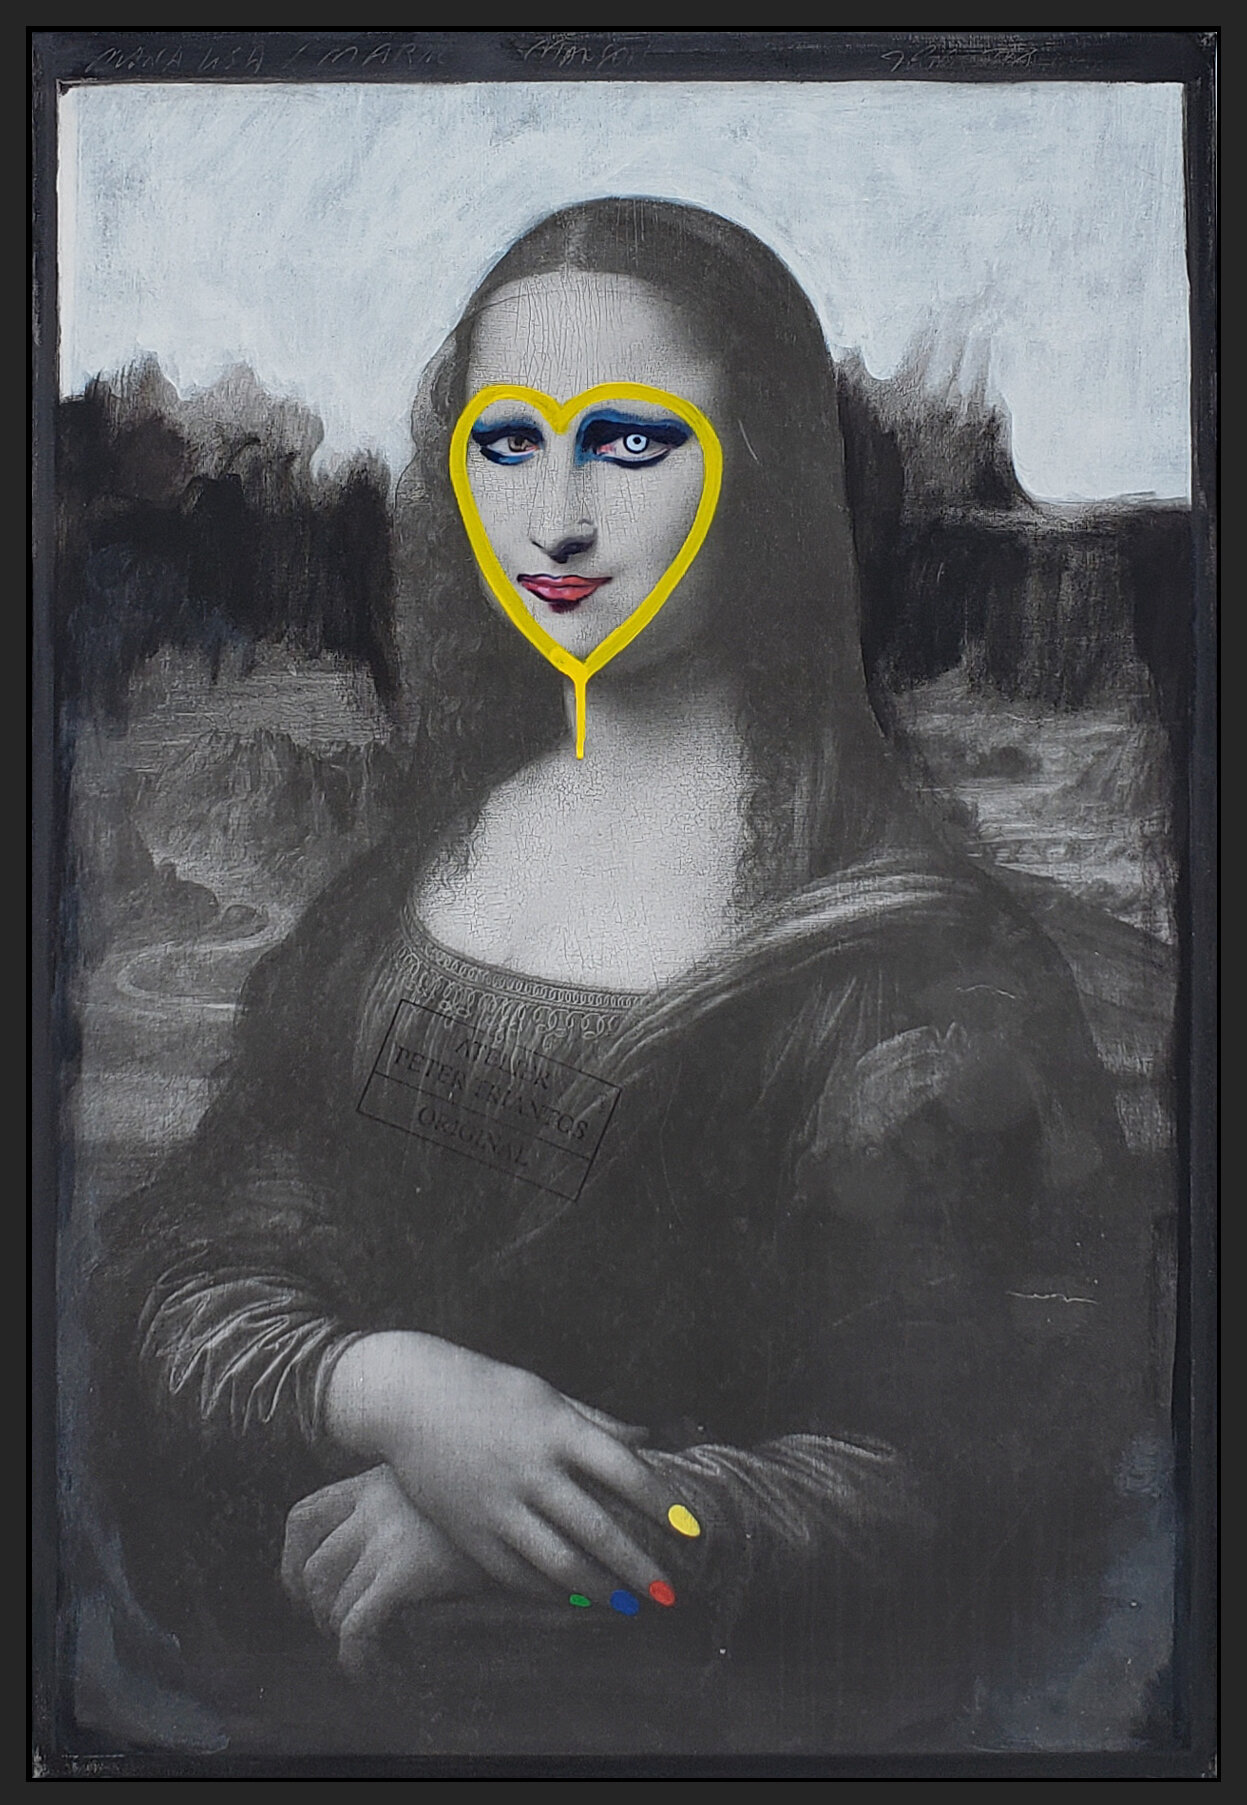 "Mona Manson, 2019, acrylic on canvas, 36"" x 24"" (91.4 x 61cm)"